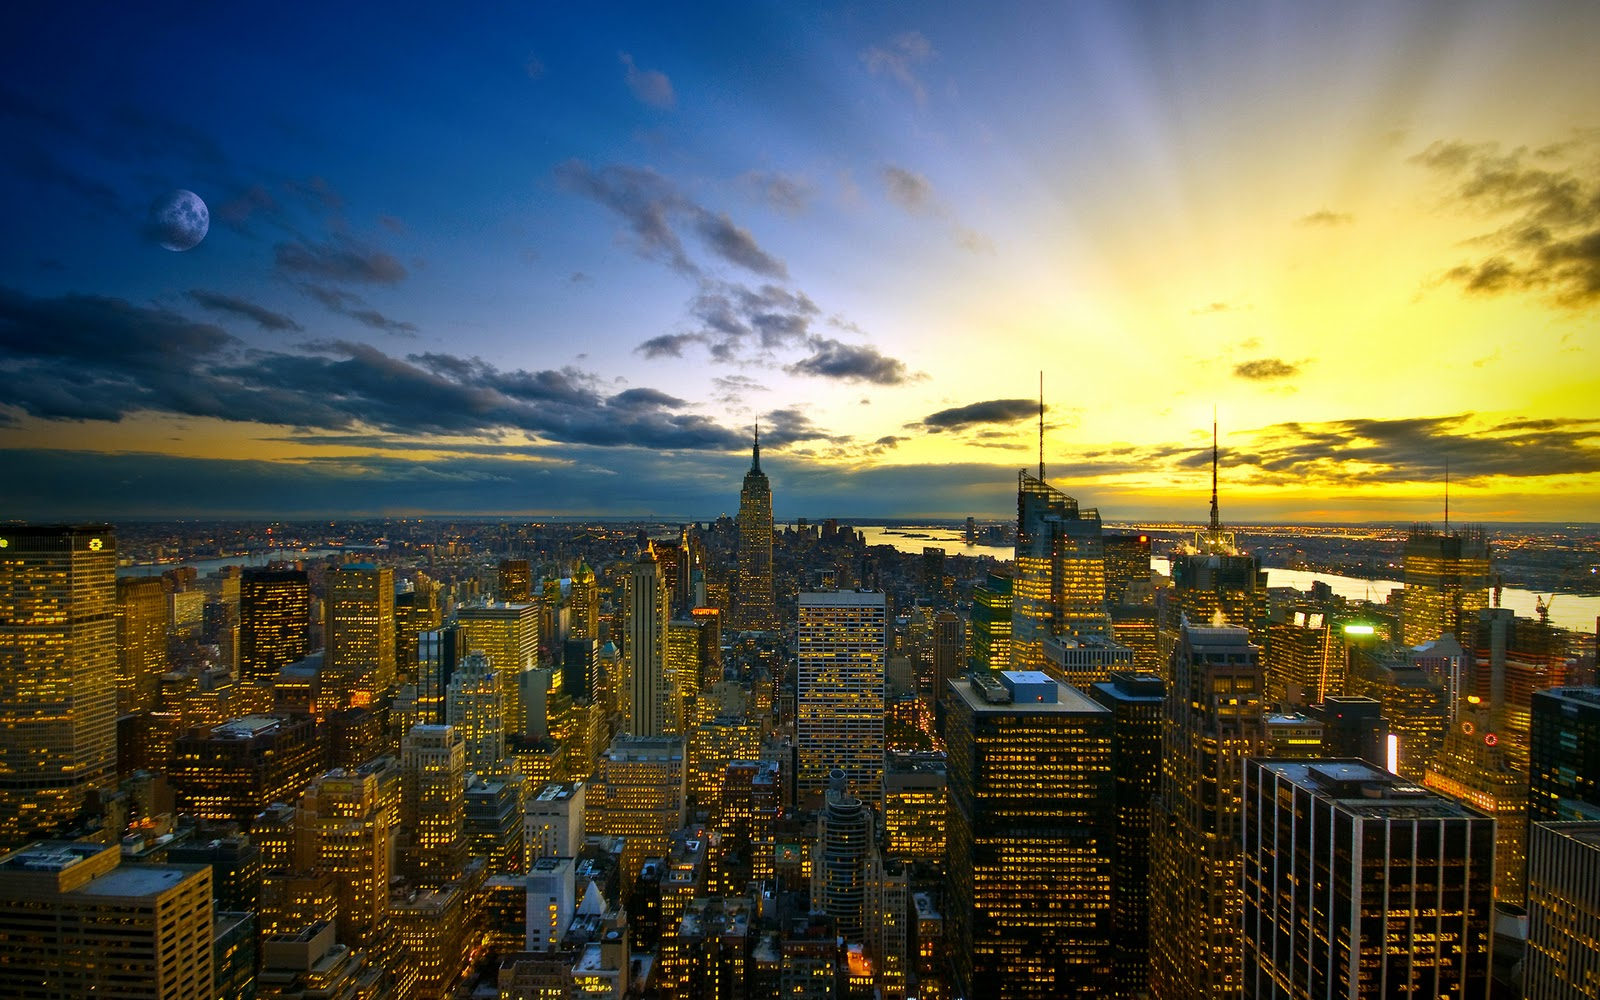 http://1.bp.blogspot.com/-qOaQ3MAgiUM/Txl7EMtwsKI/AAAAAAAAEL0/q0VHHjdlRA0/s1600/new-york-city-3.jpg